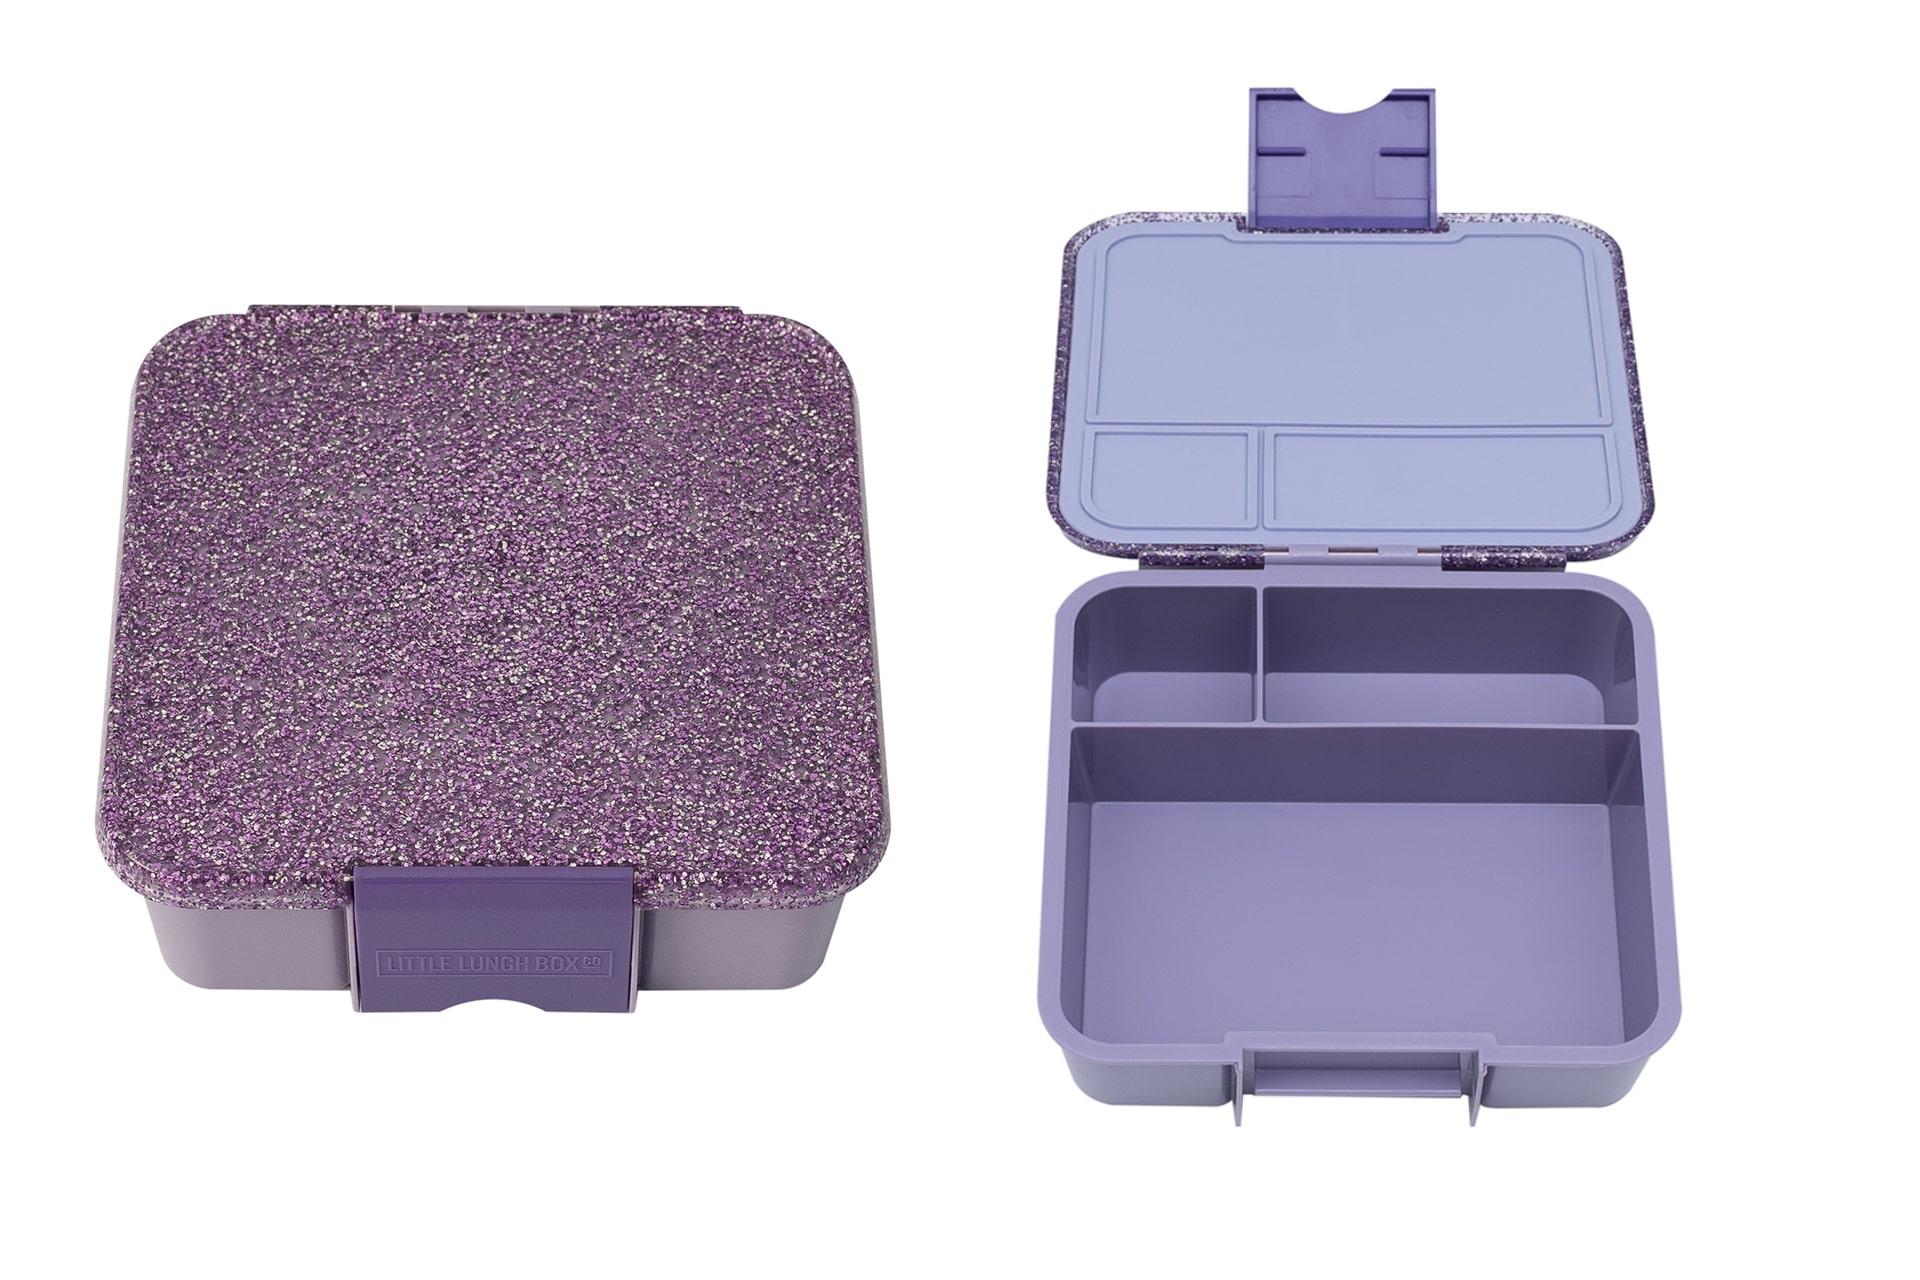 purple sparkly lunch box